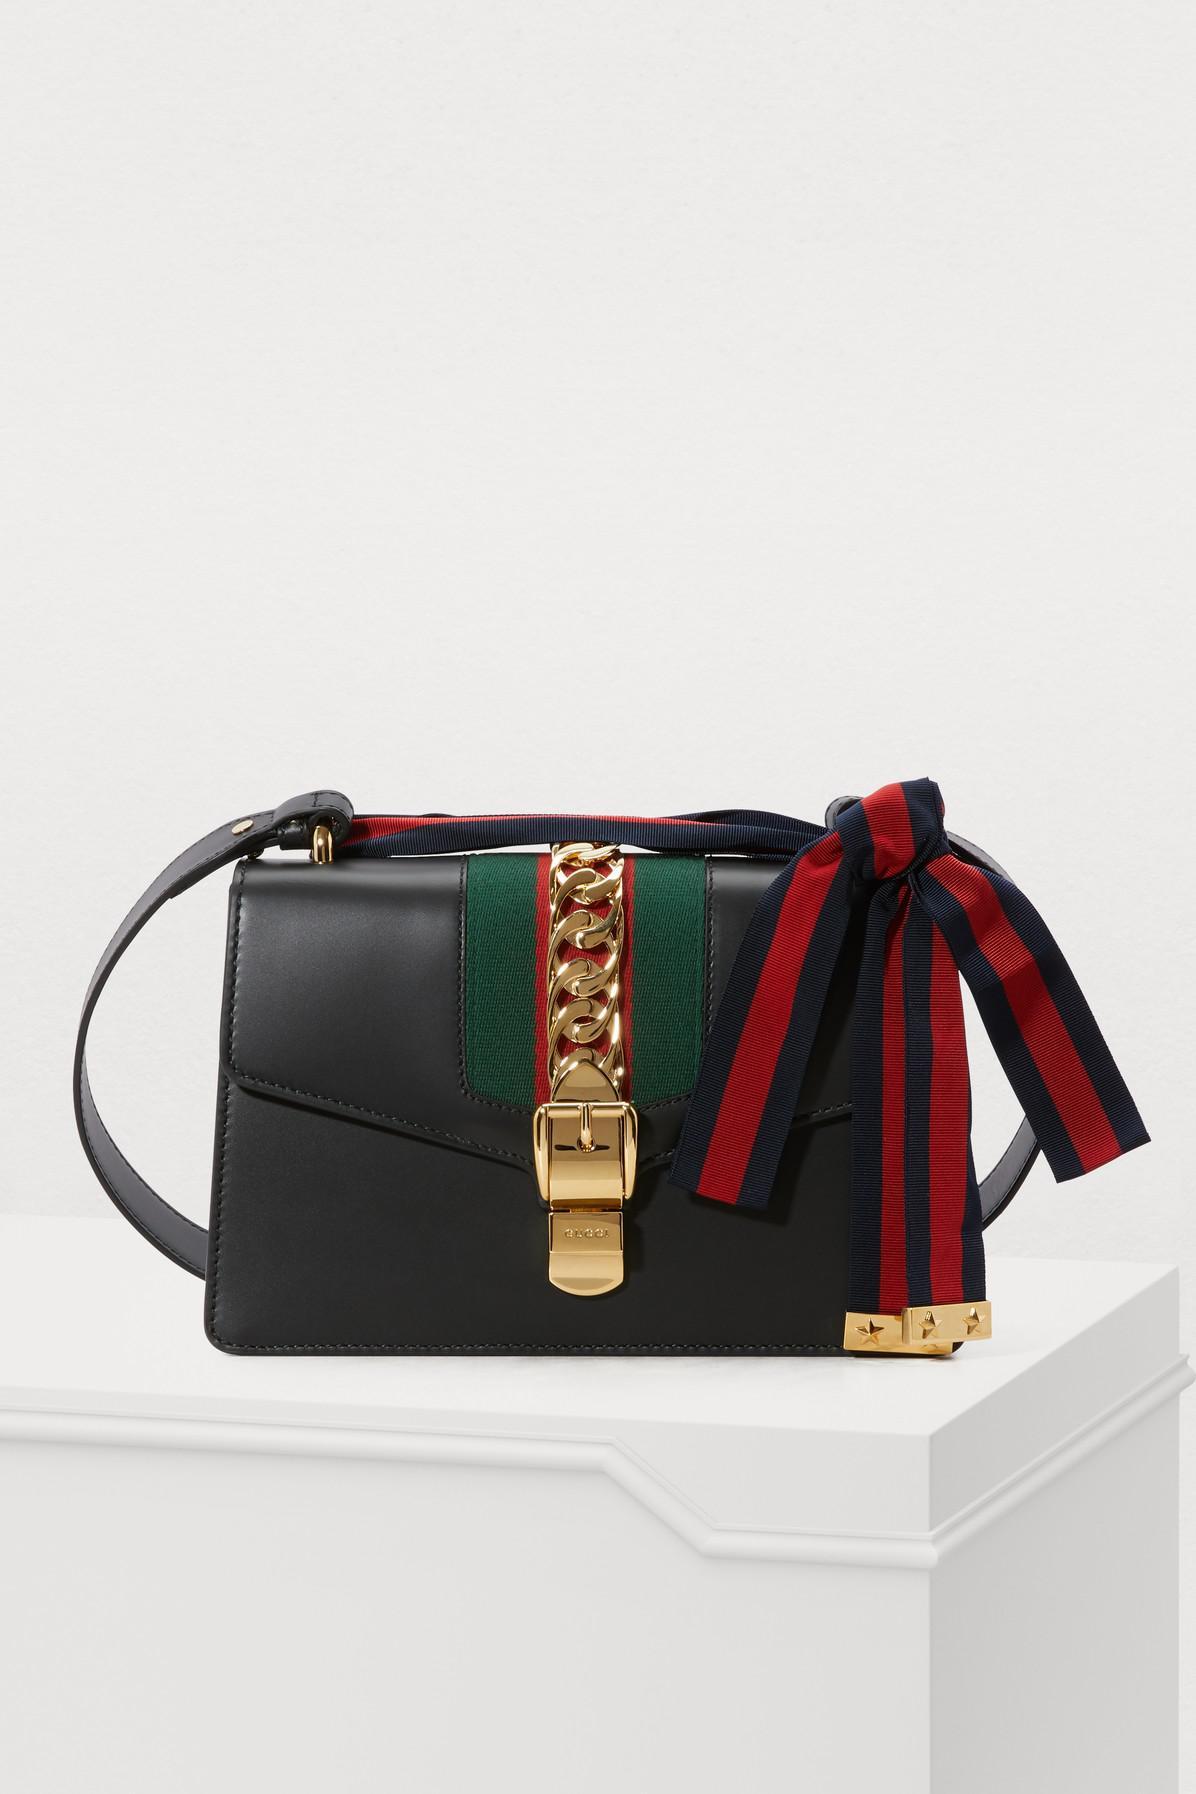 c1475f766d35 Gucci Sylvie Leather Shoulder Bag in Black - Lyst